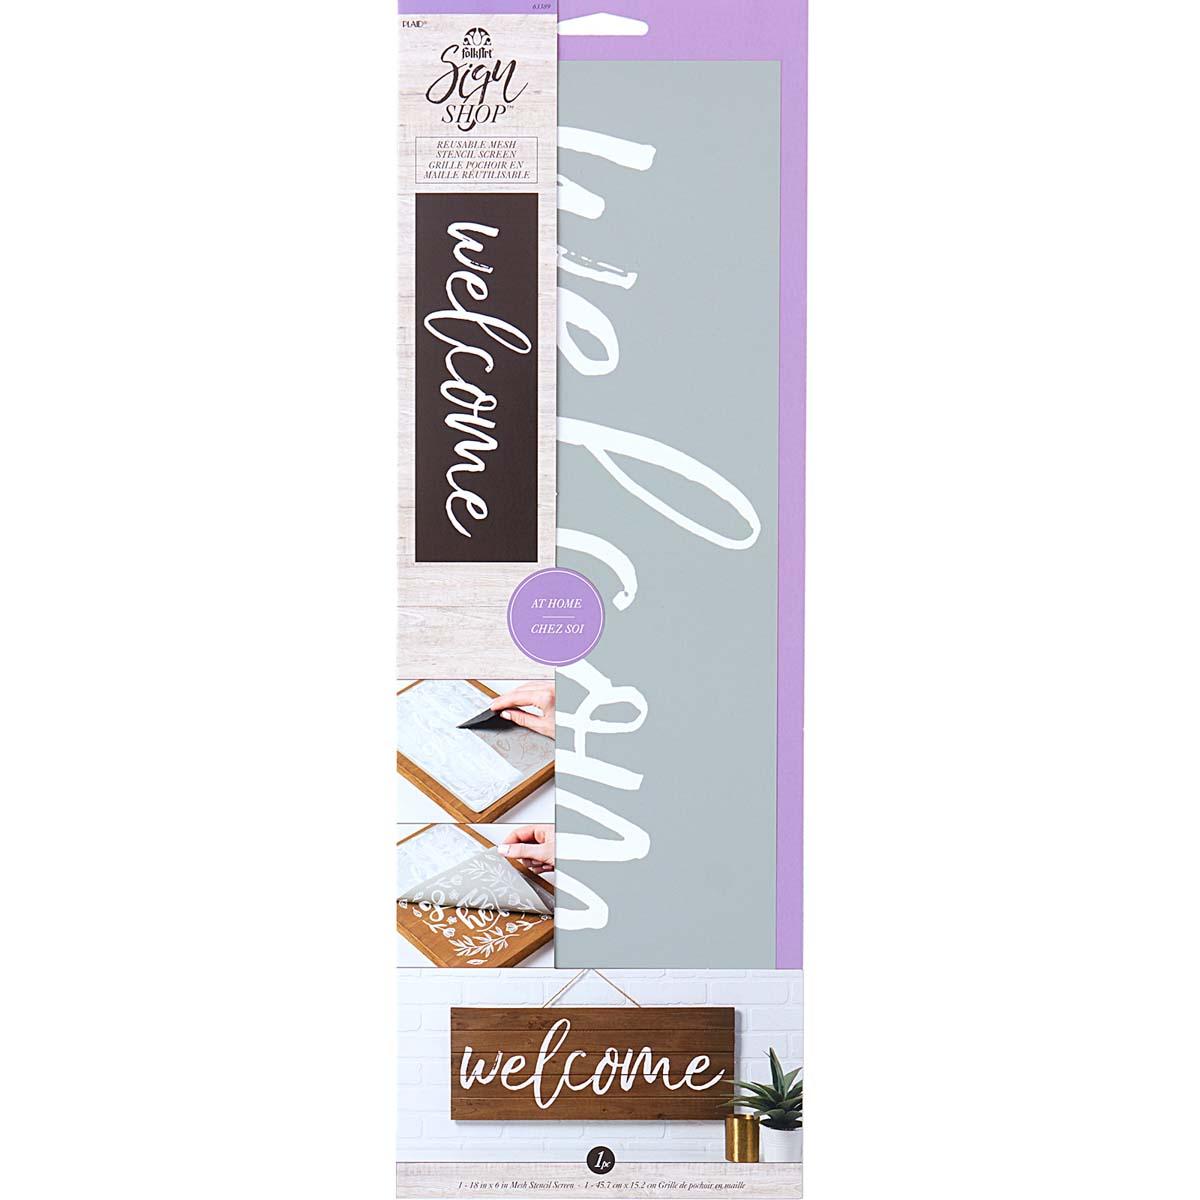 FolkArt ® Sign Shop™ Mesh Stencil - Welcome - 63389